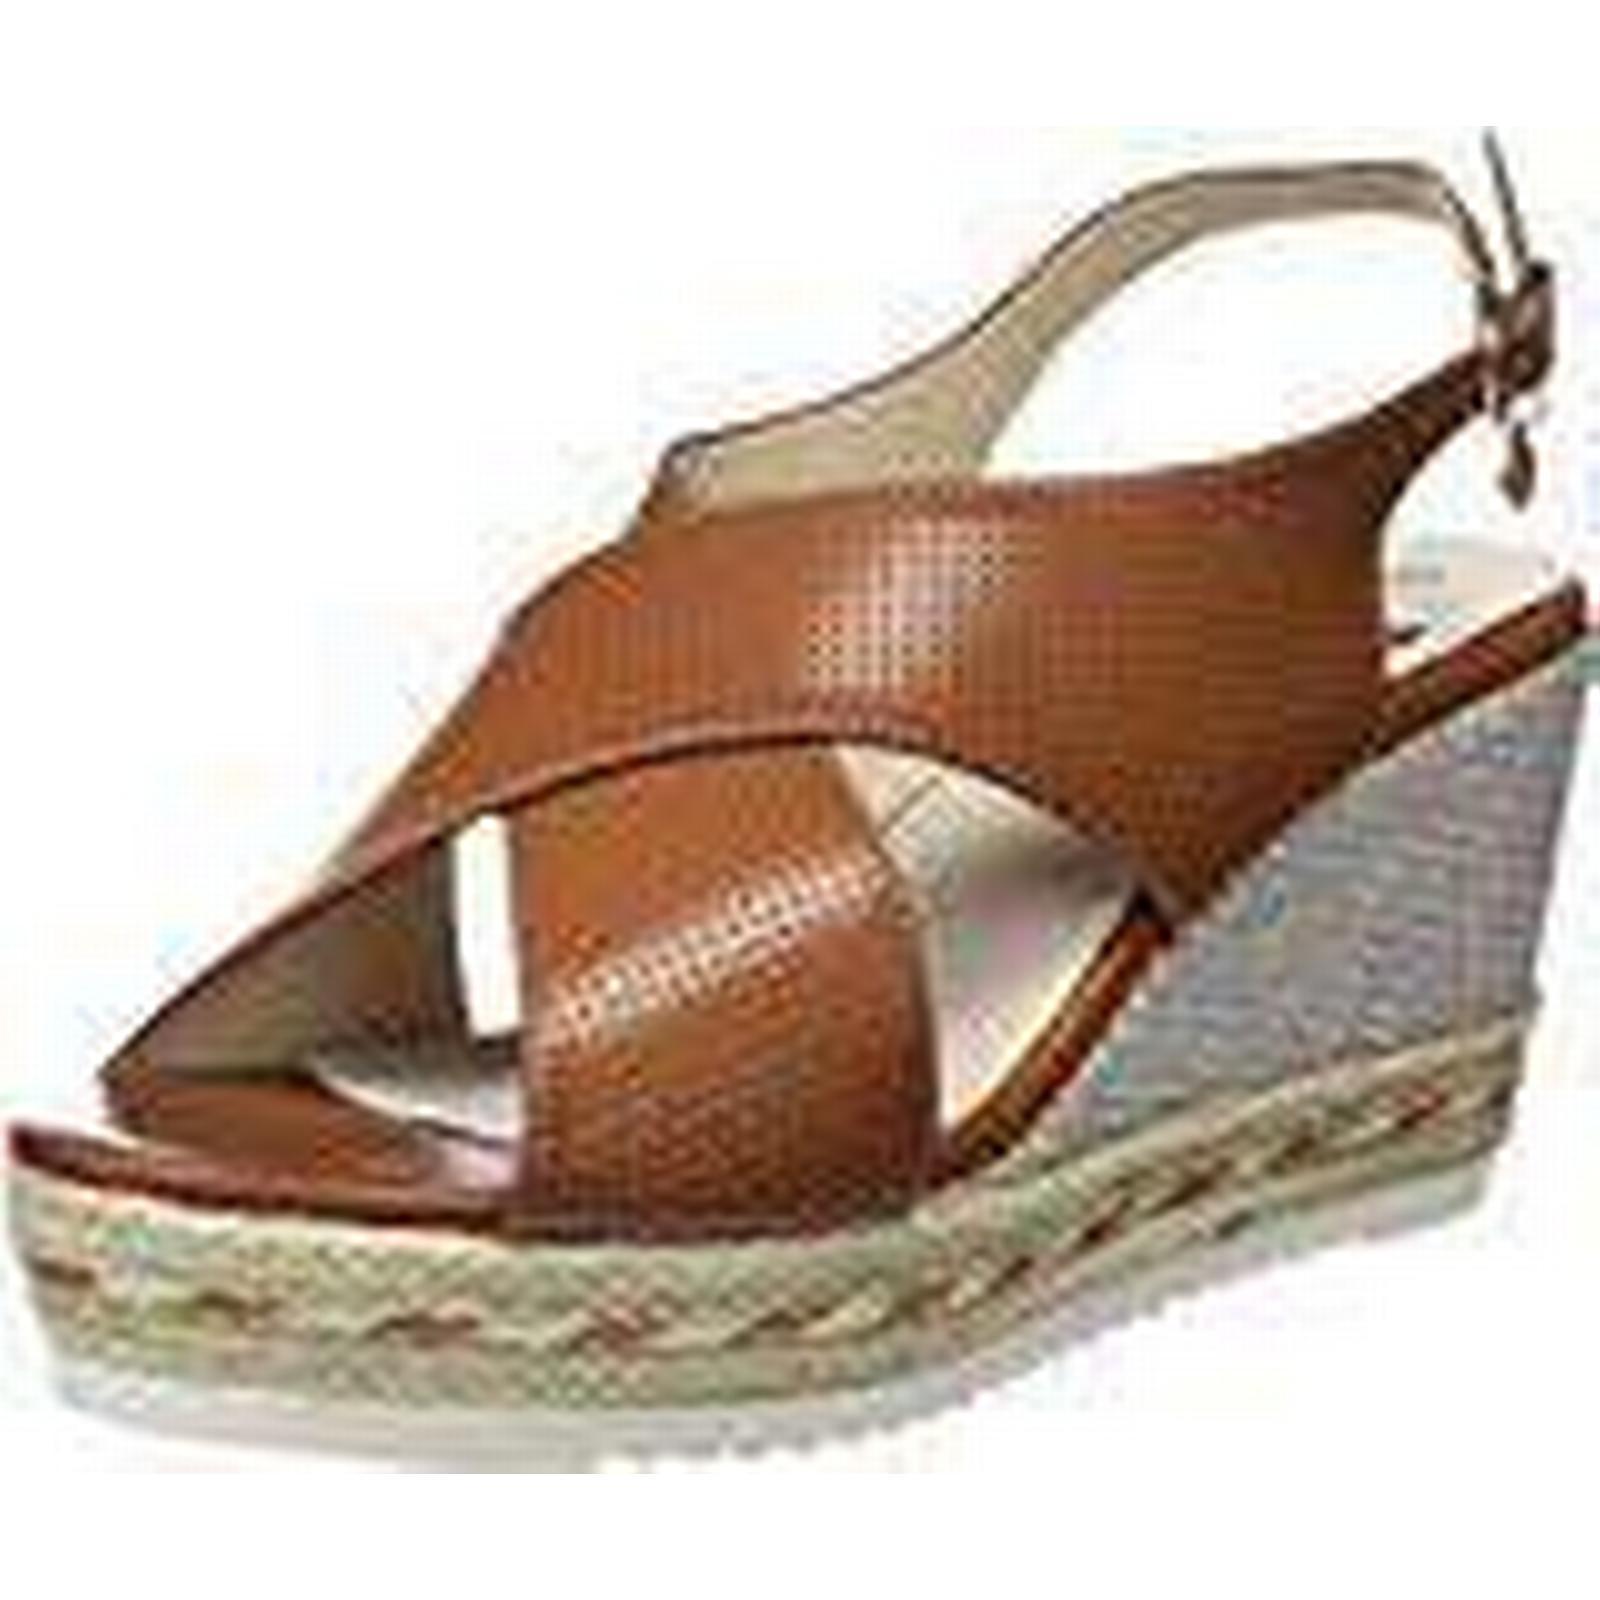 XTI Women's 47655 (Camel), Open Toe Sandals, Brown (Camel), 47655 5.5 UK 580d45